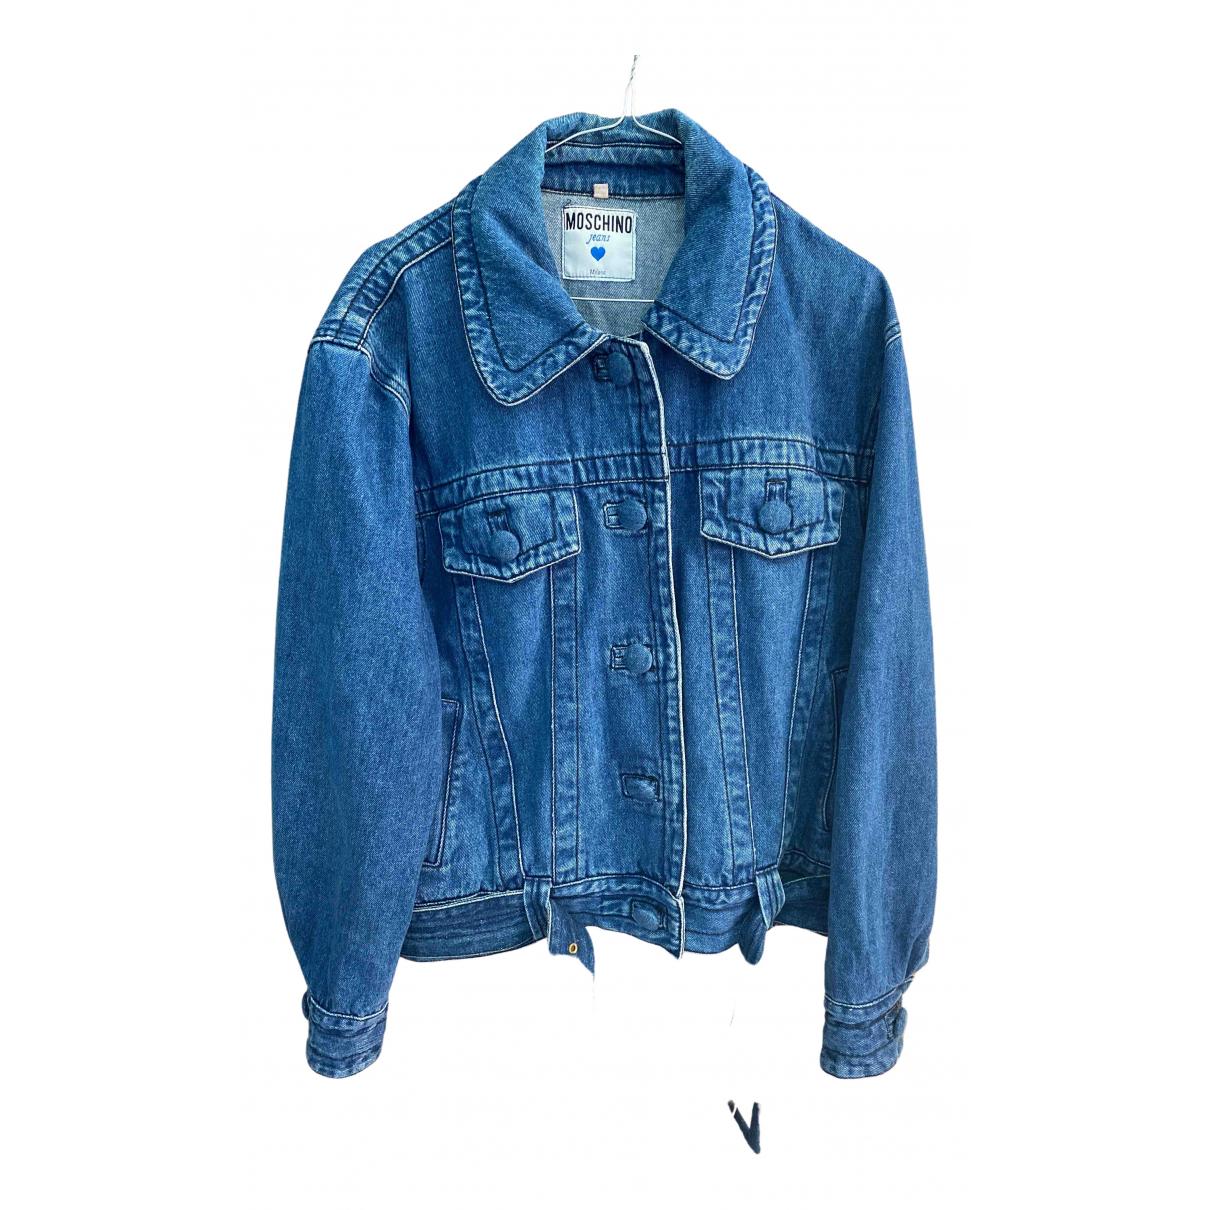 Moschino N Blue Denim - Jeans jacket for Women 42 IT